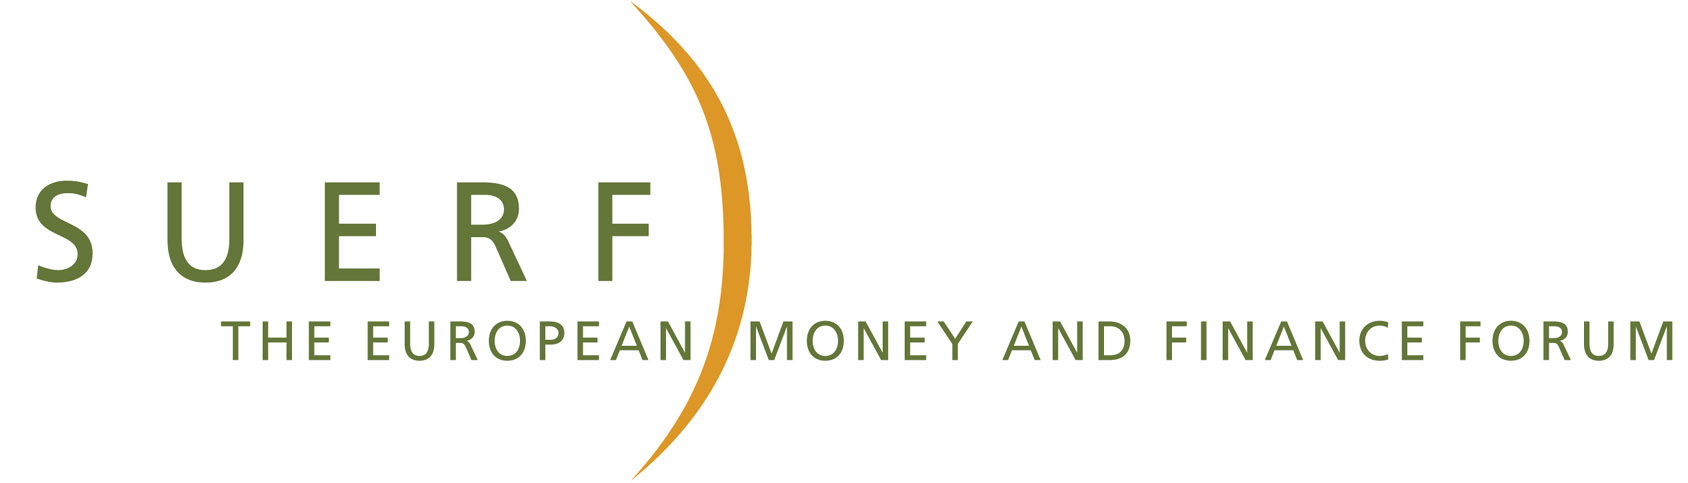 logo for SUERF - The European Money and Finance Forum